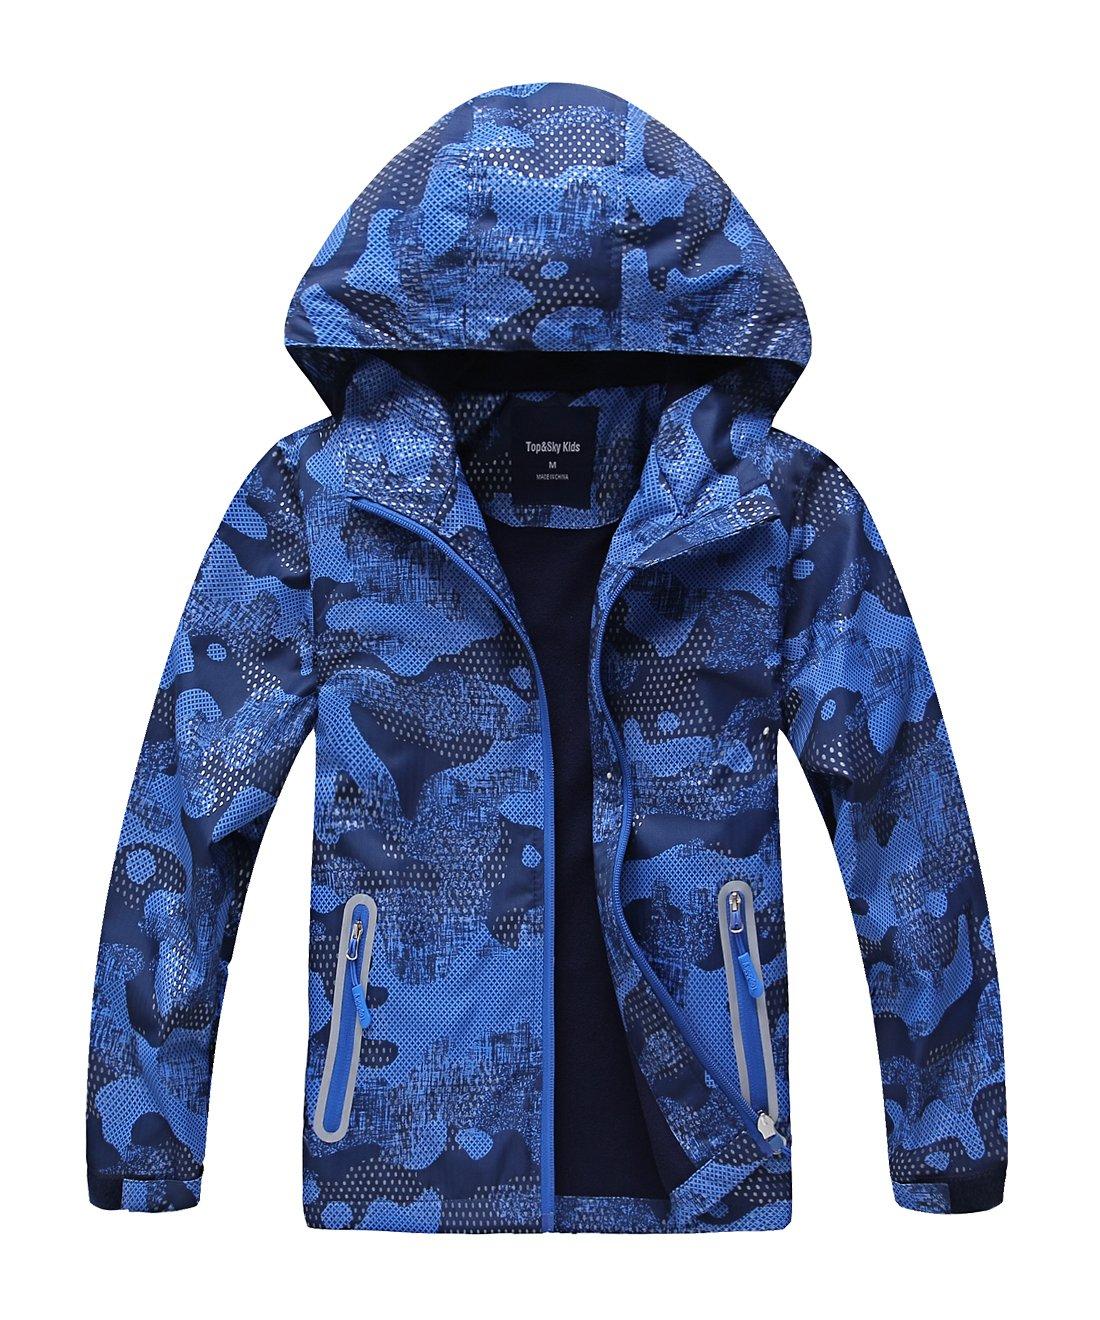 Hiheart Boys Windproof Fleece Lined Padded Jacket Outdoor Coat with Hood Blue 7/8